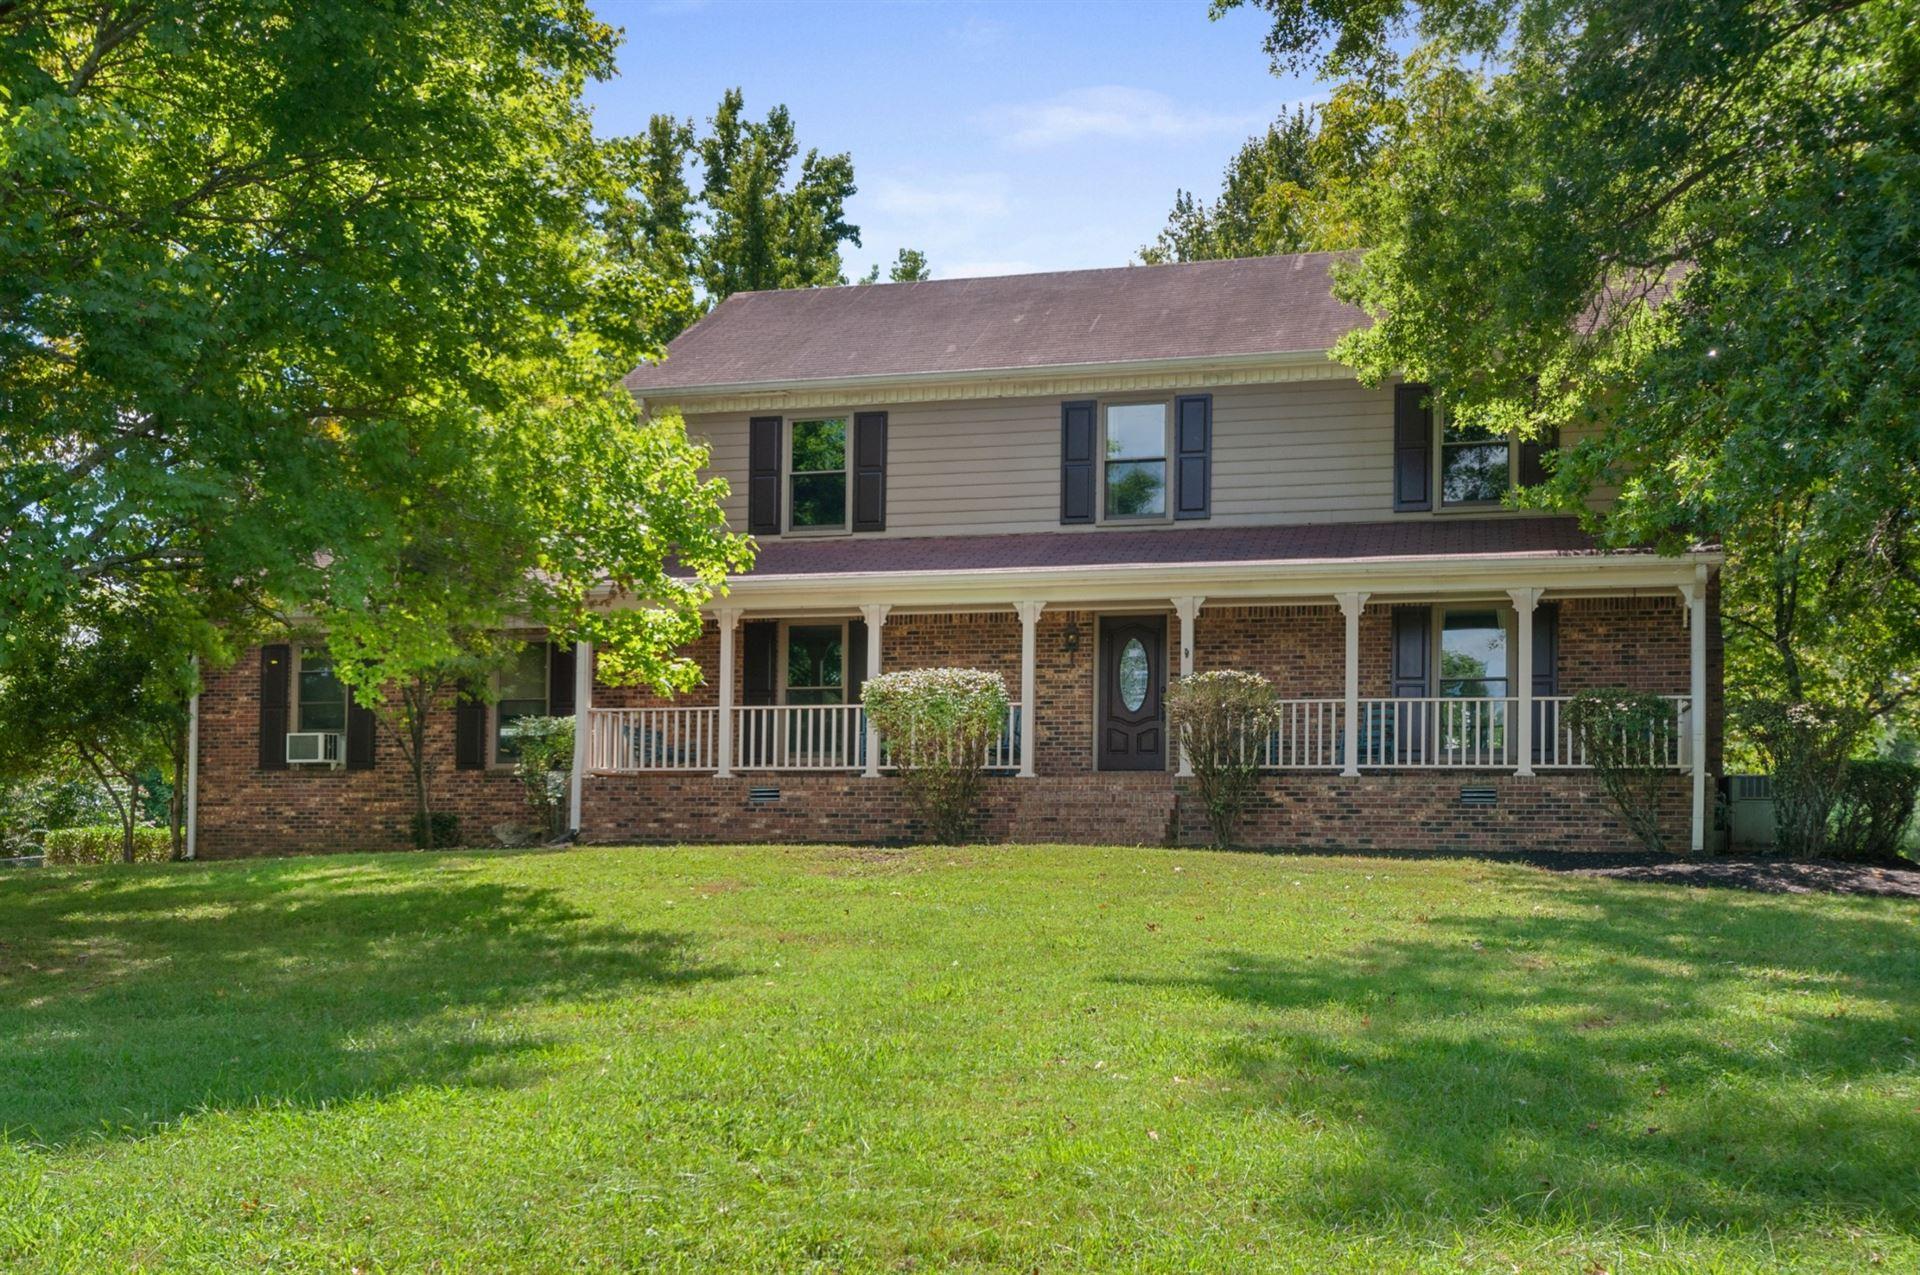 153 Faulkner Lane, Mount Juliet, TN 37122 - MLS#: 2292488